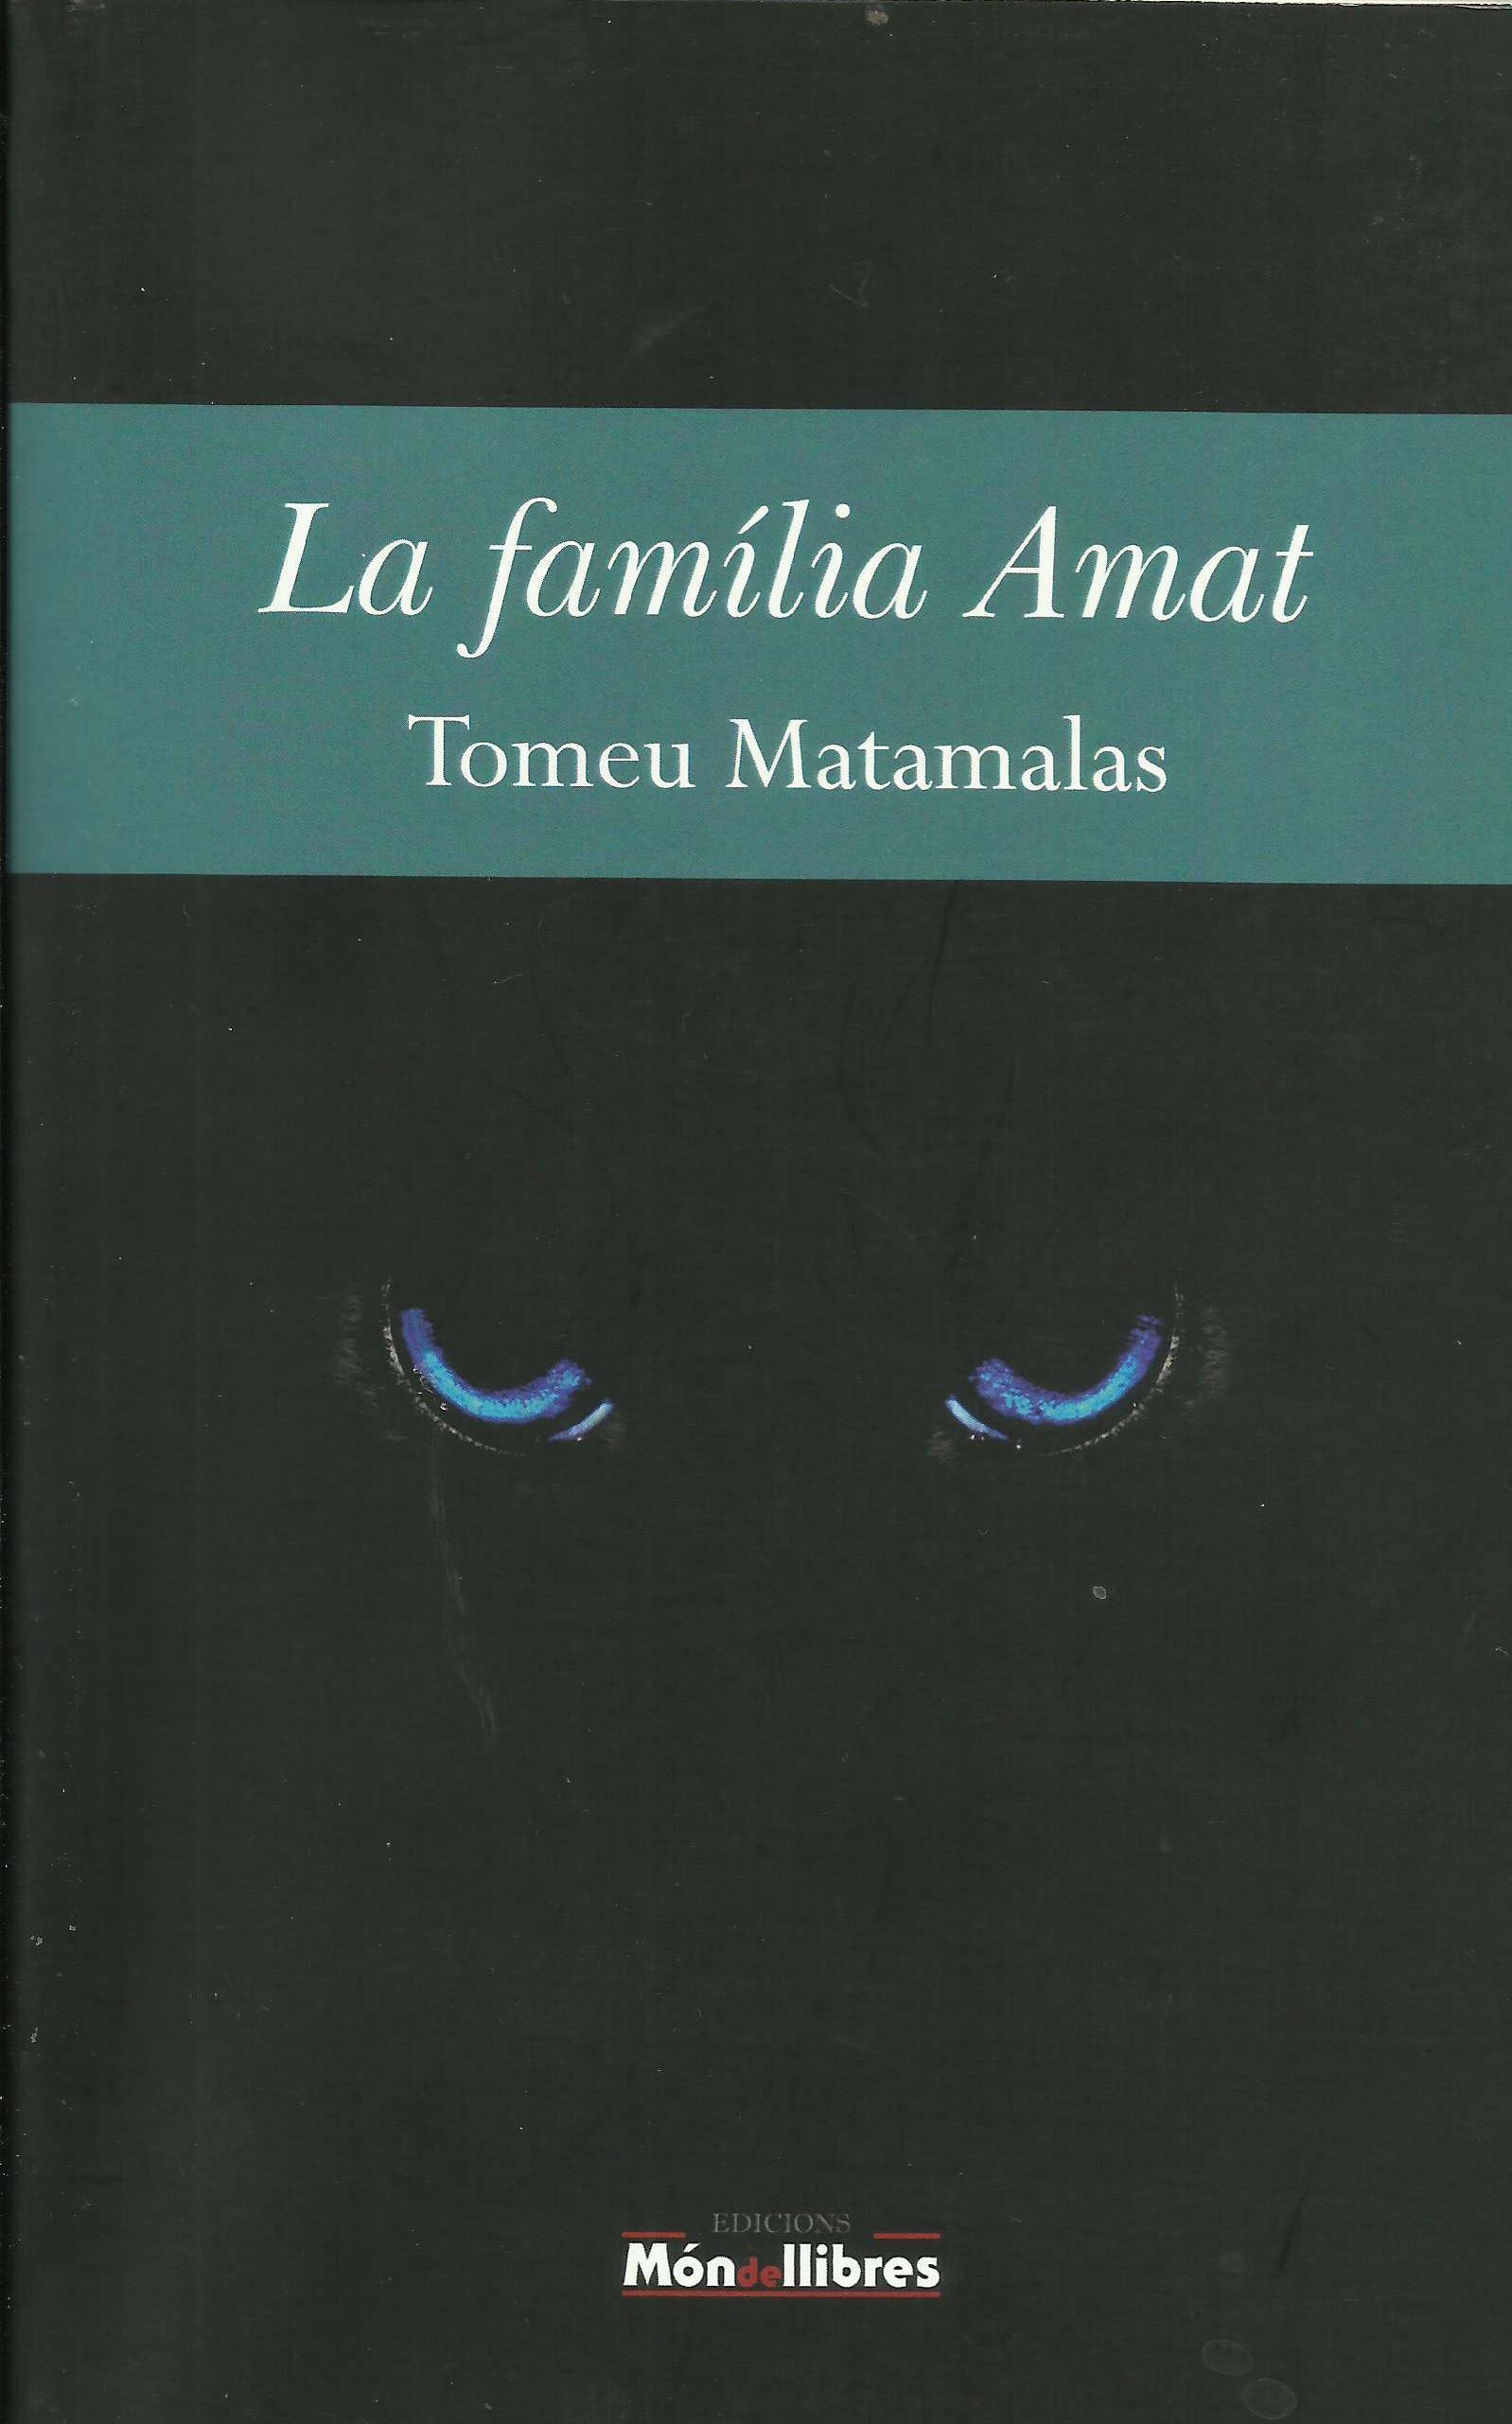 La familia Amat